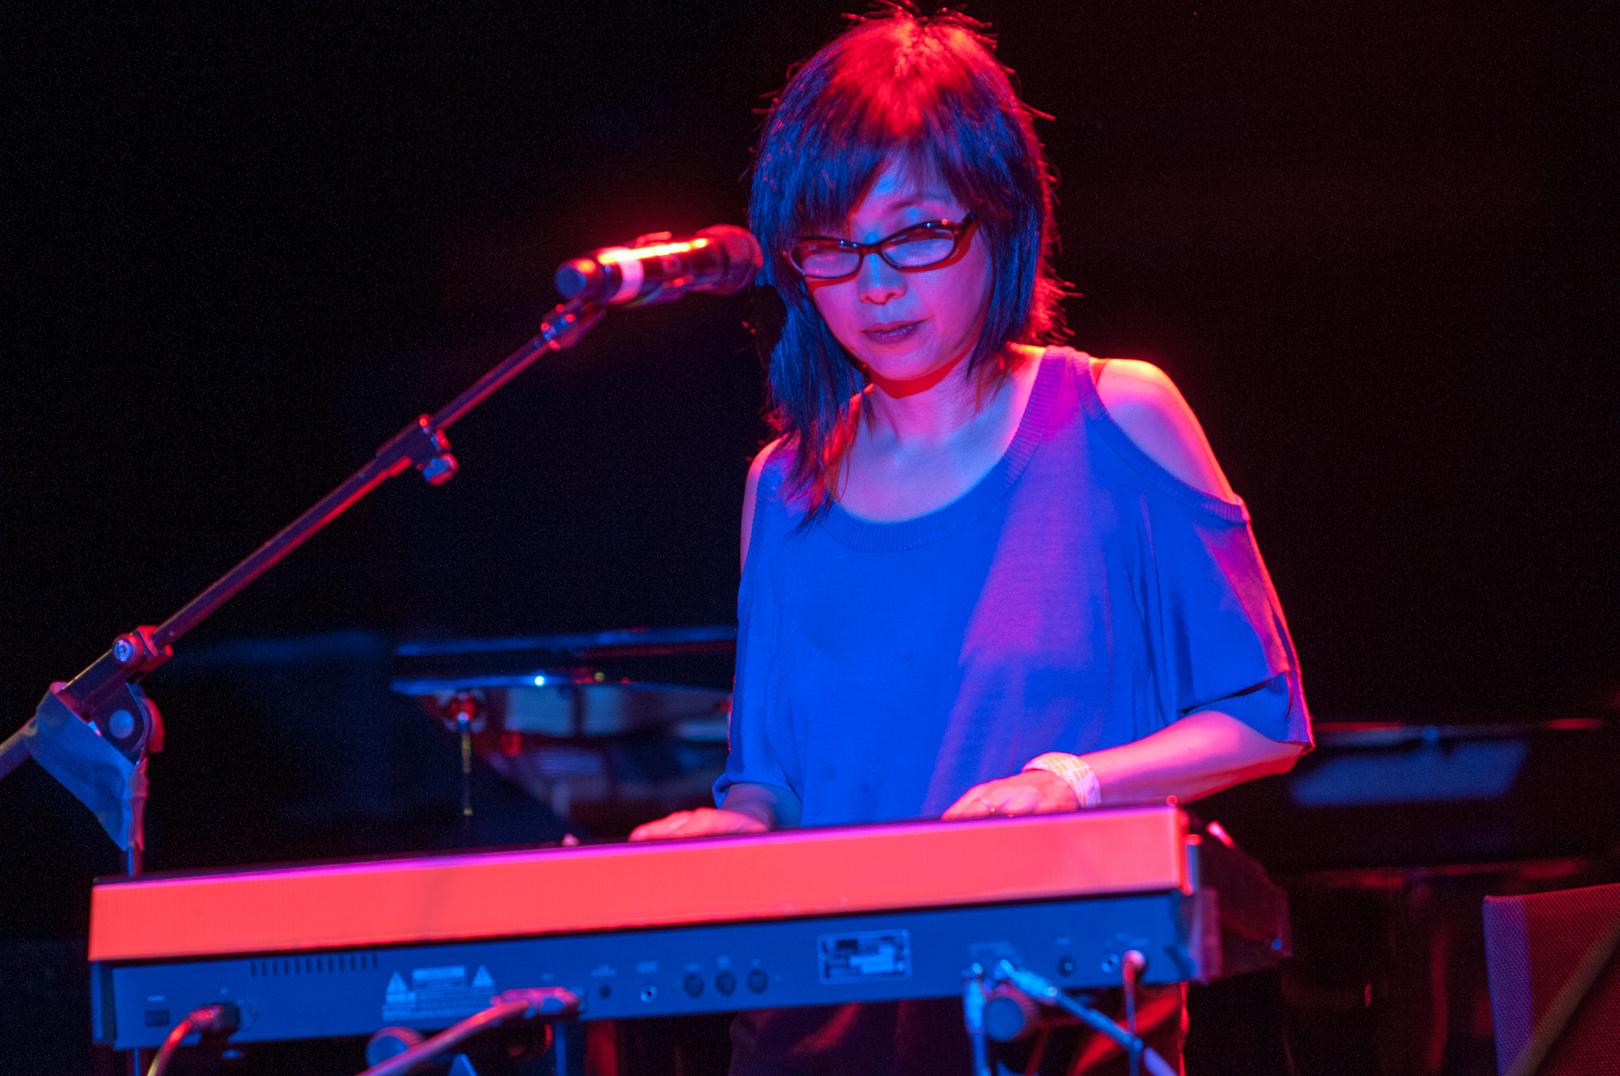 Yuka Honda with Eucademix at the Undead Music Festival